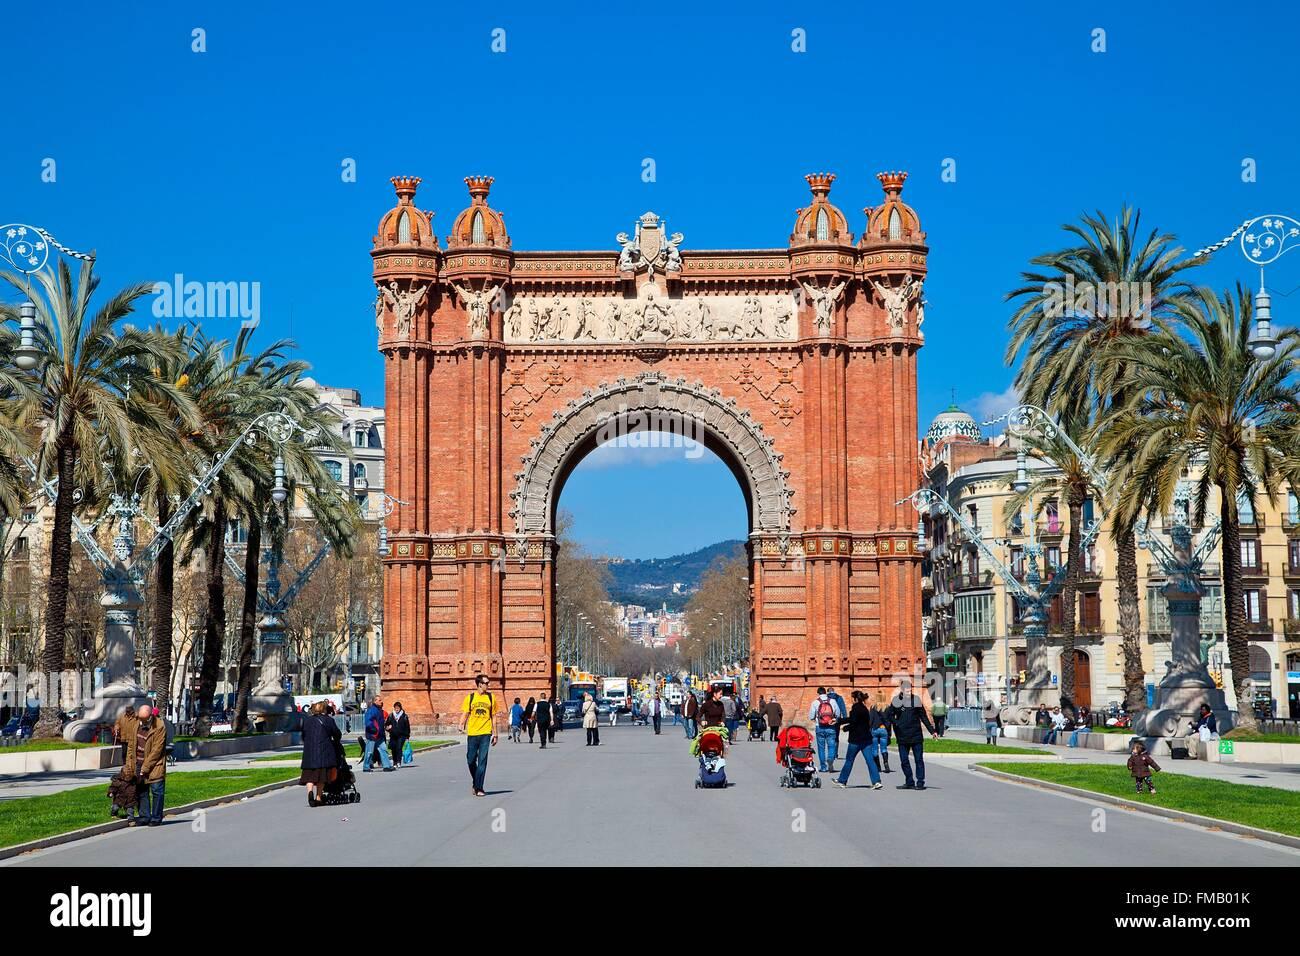 Spain, Catalonia, Barcelona, the Arc de Triomf by the architect Josep Vilaseca i Casanovas as main entrance for - Stock Image